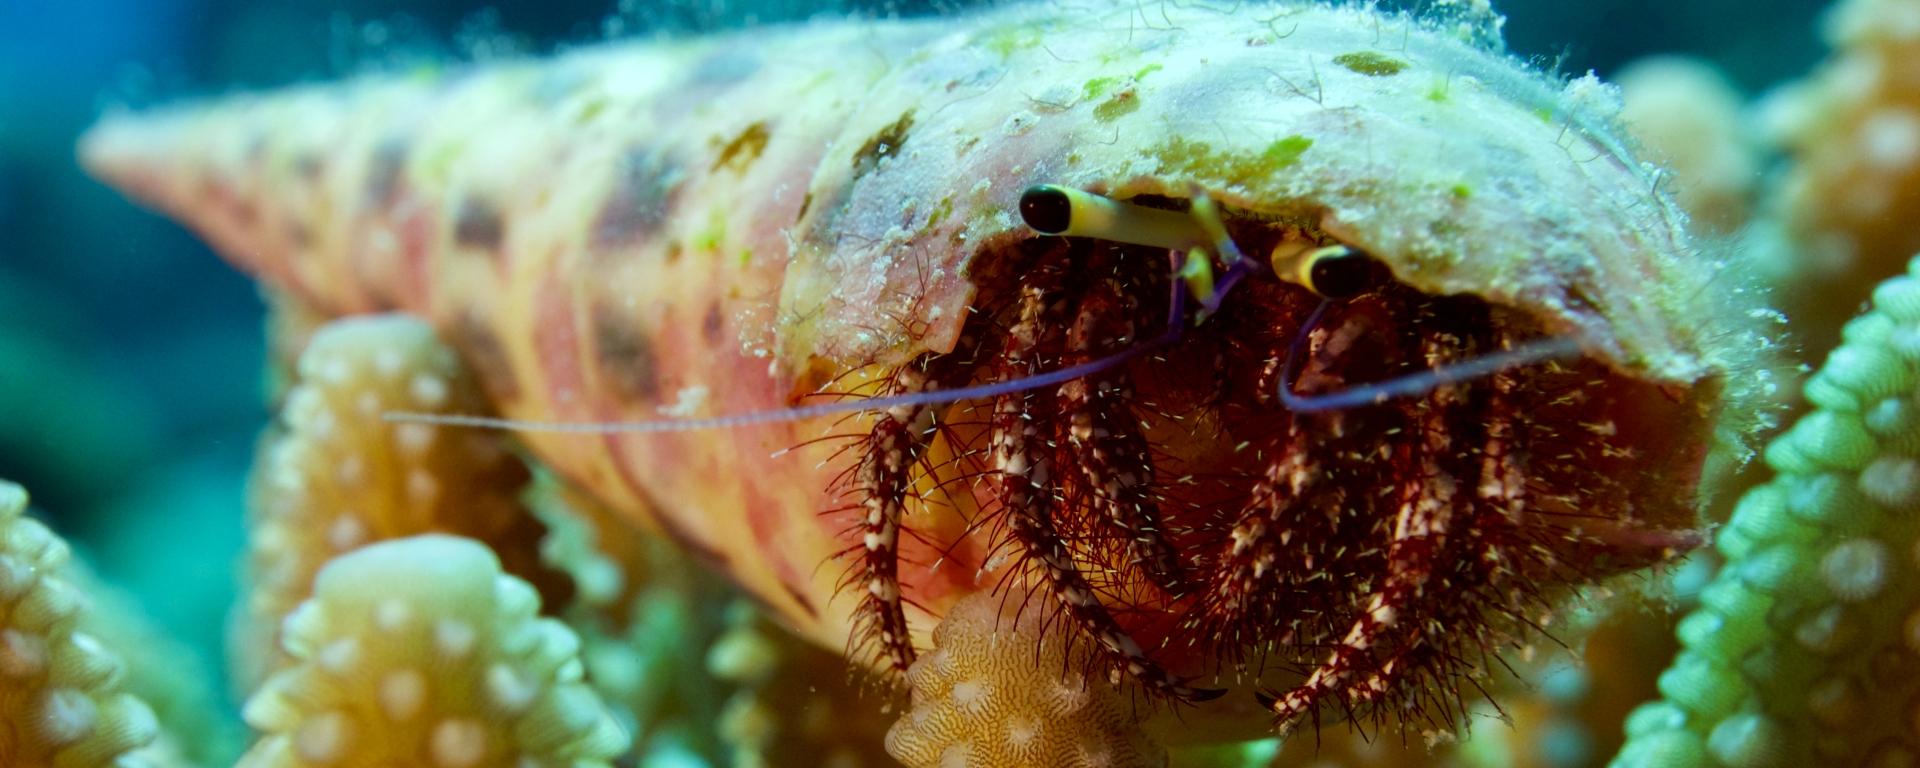 hermit crab sitting on coral